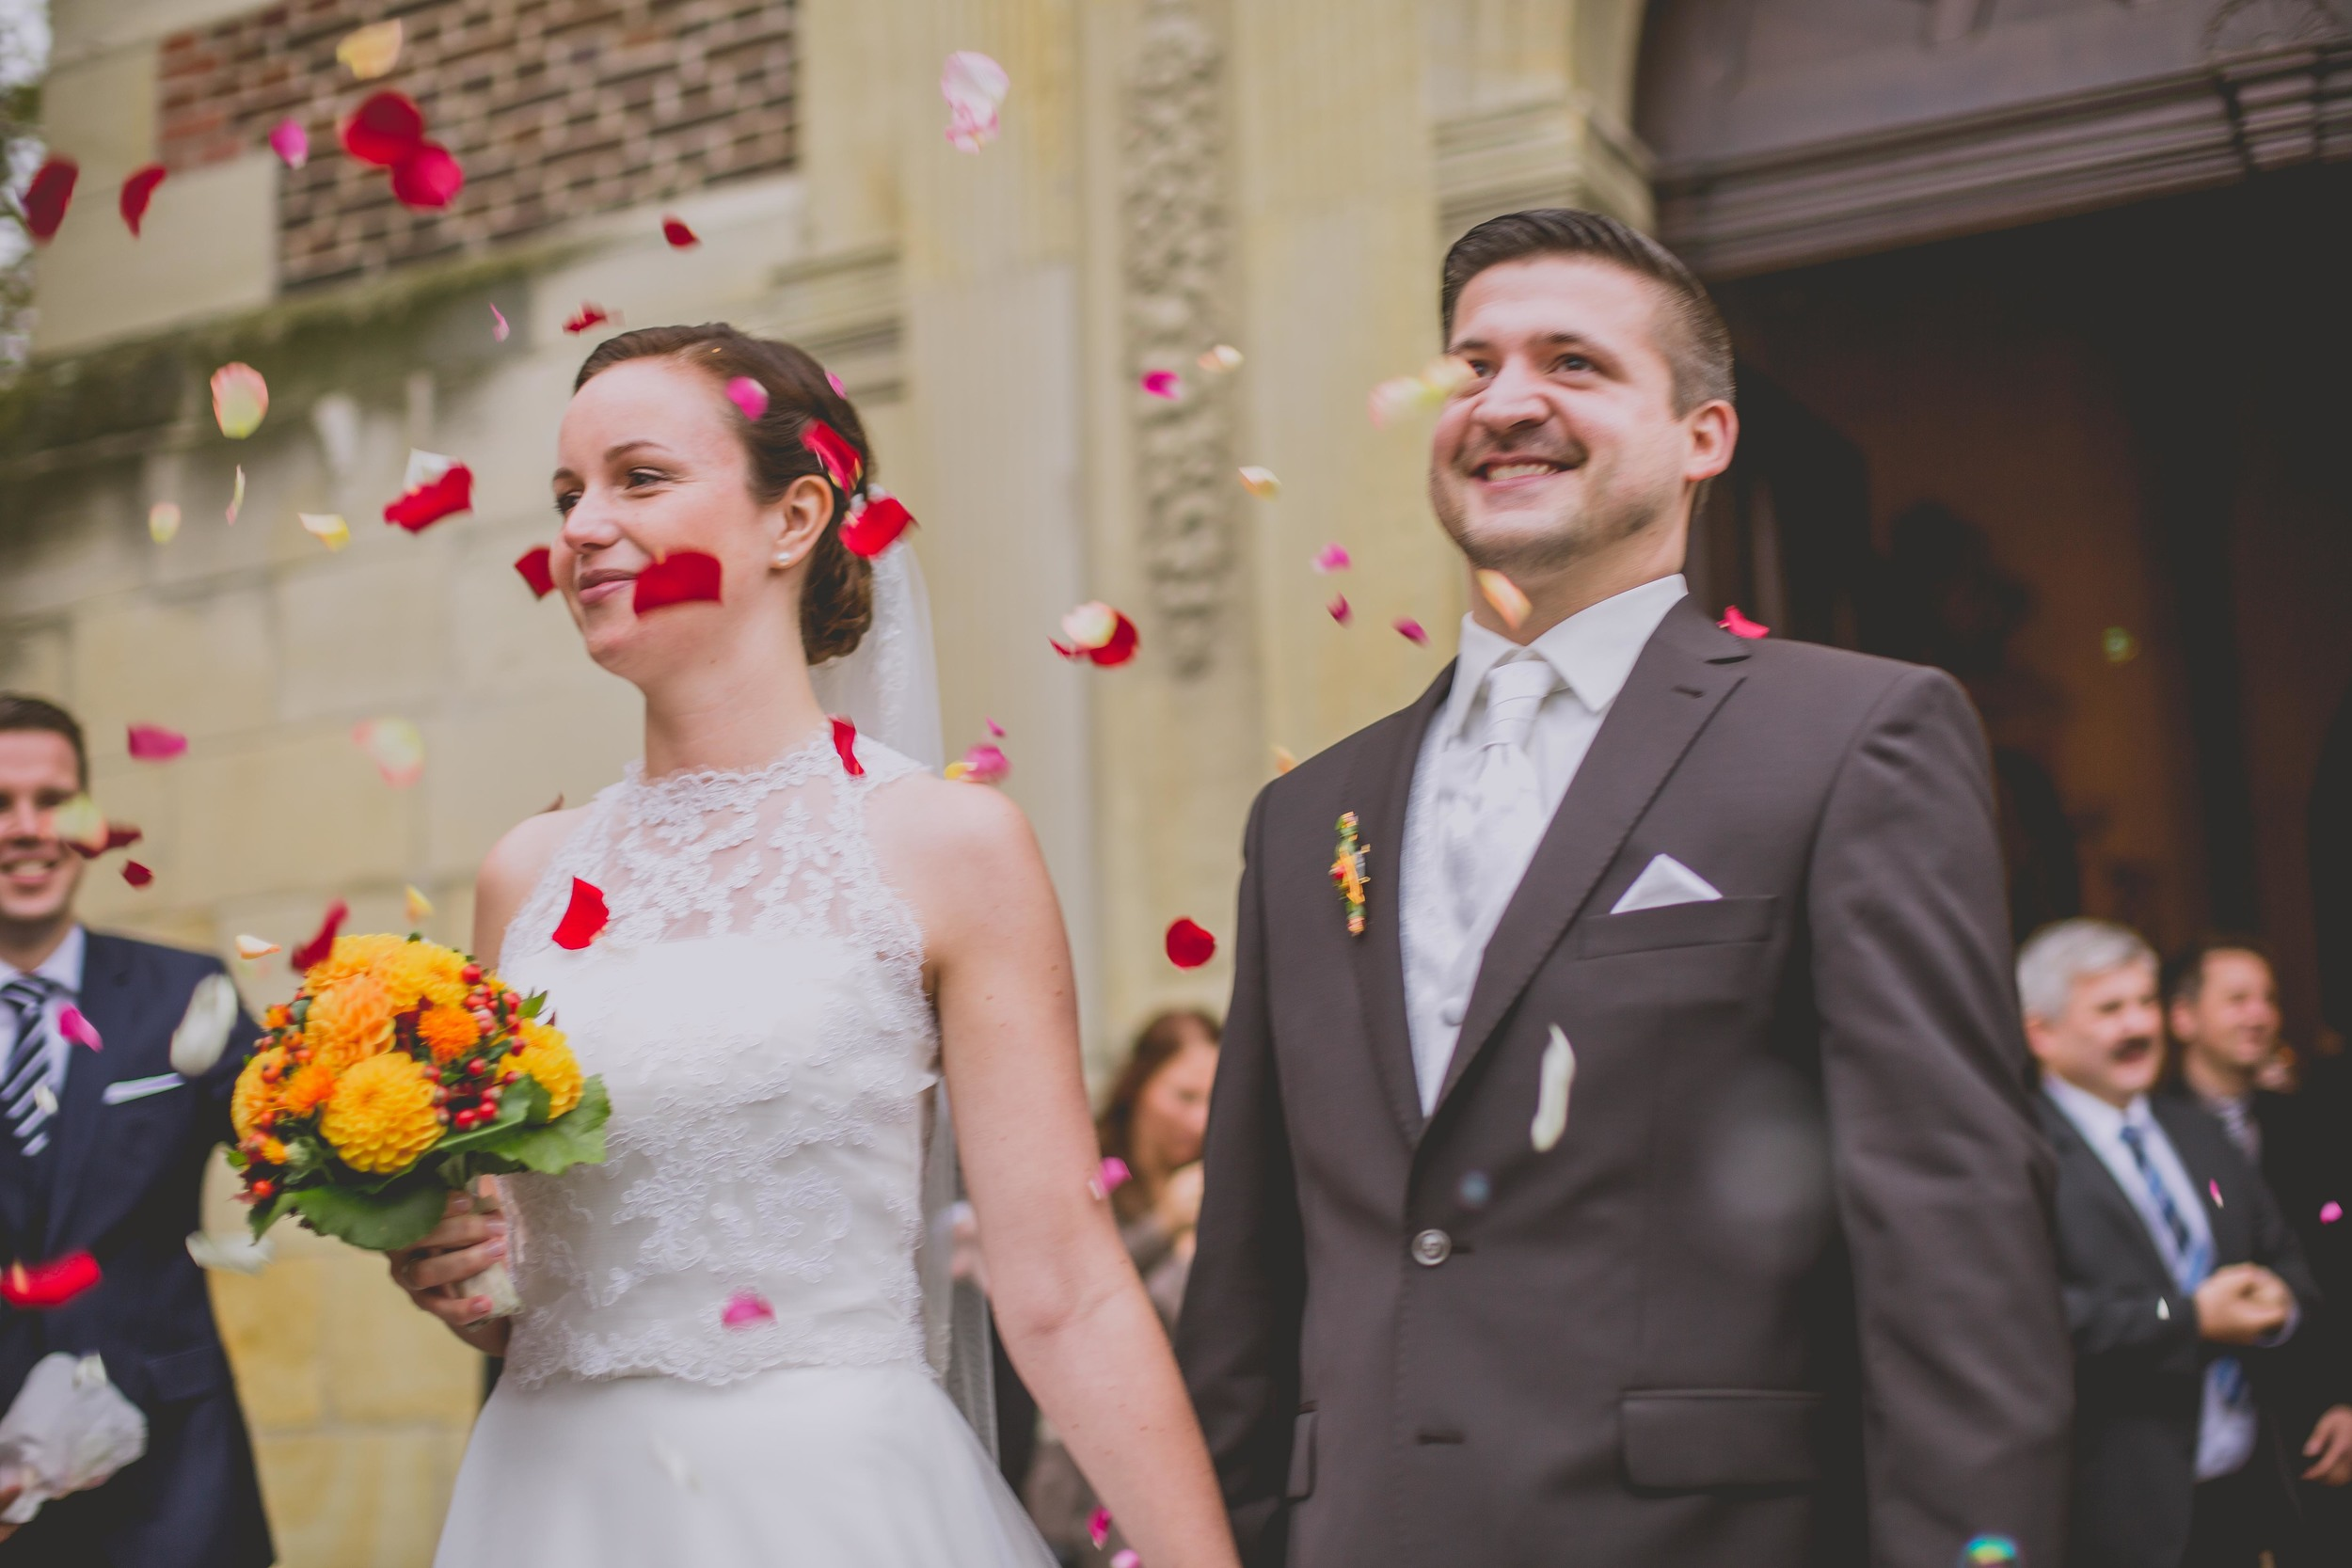 Buffalo-Wedding-Photography-by-Stefan-Ludwig10252014WEB-49.jpg